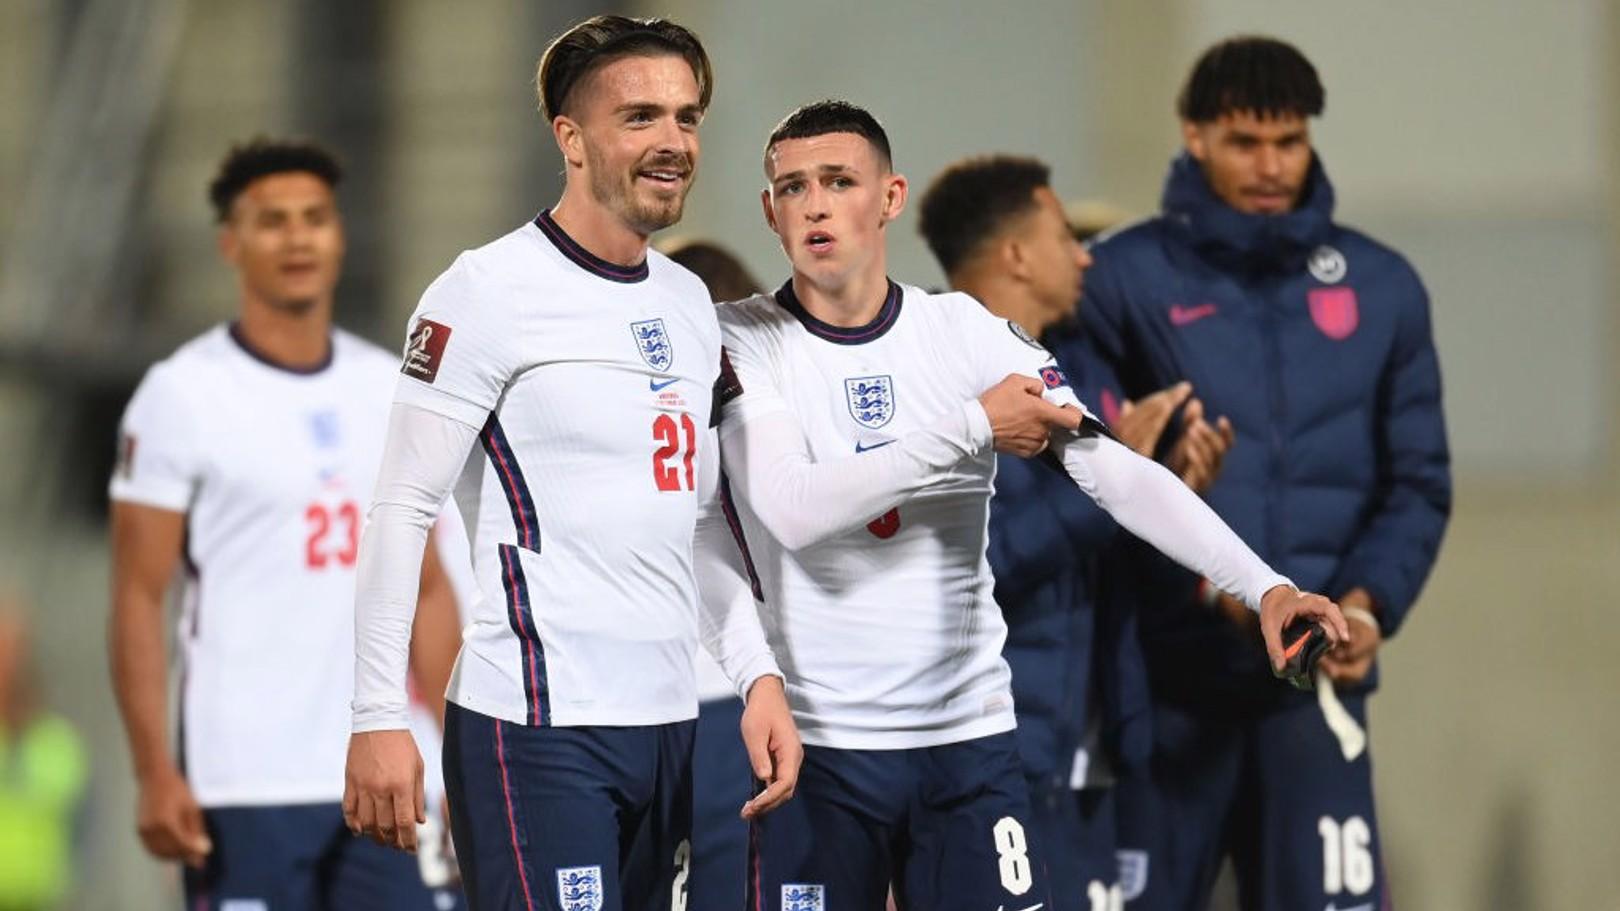 International break: Test you knowledge on City players' performances